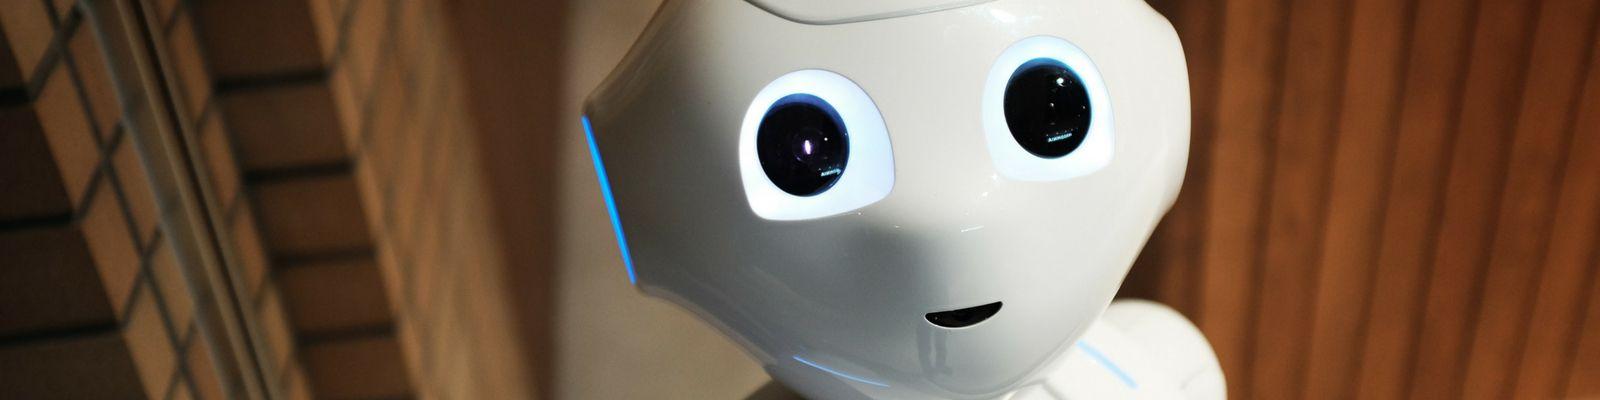 automatizacion o personas